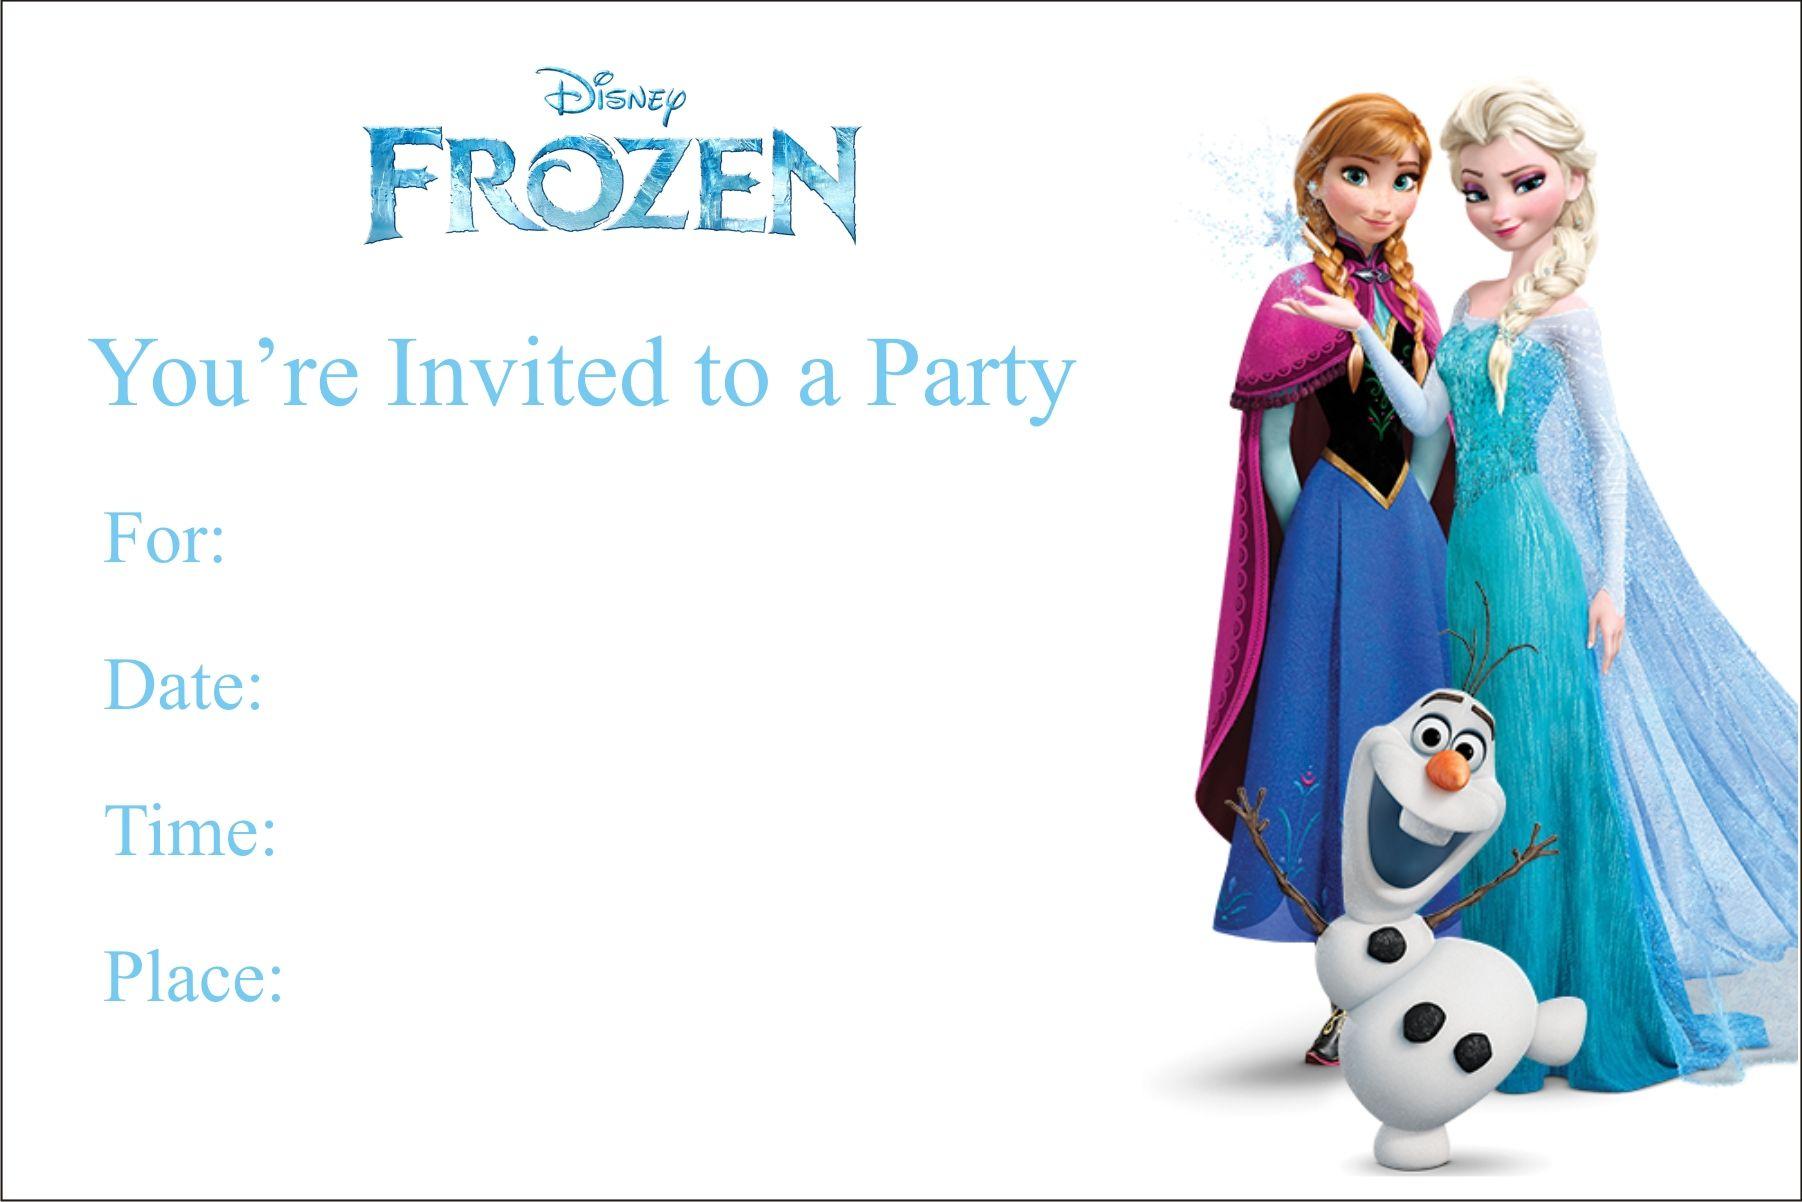 Free Printable Birthday Party Invitations | Free Printable Birthday - Birthday Party Invitations Online Free Printable